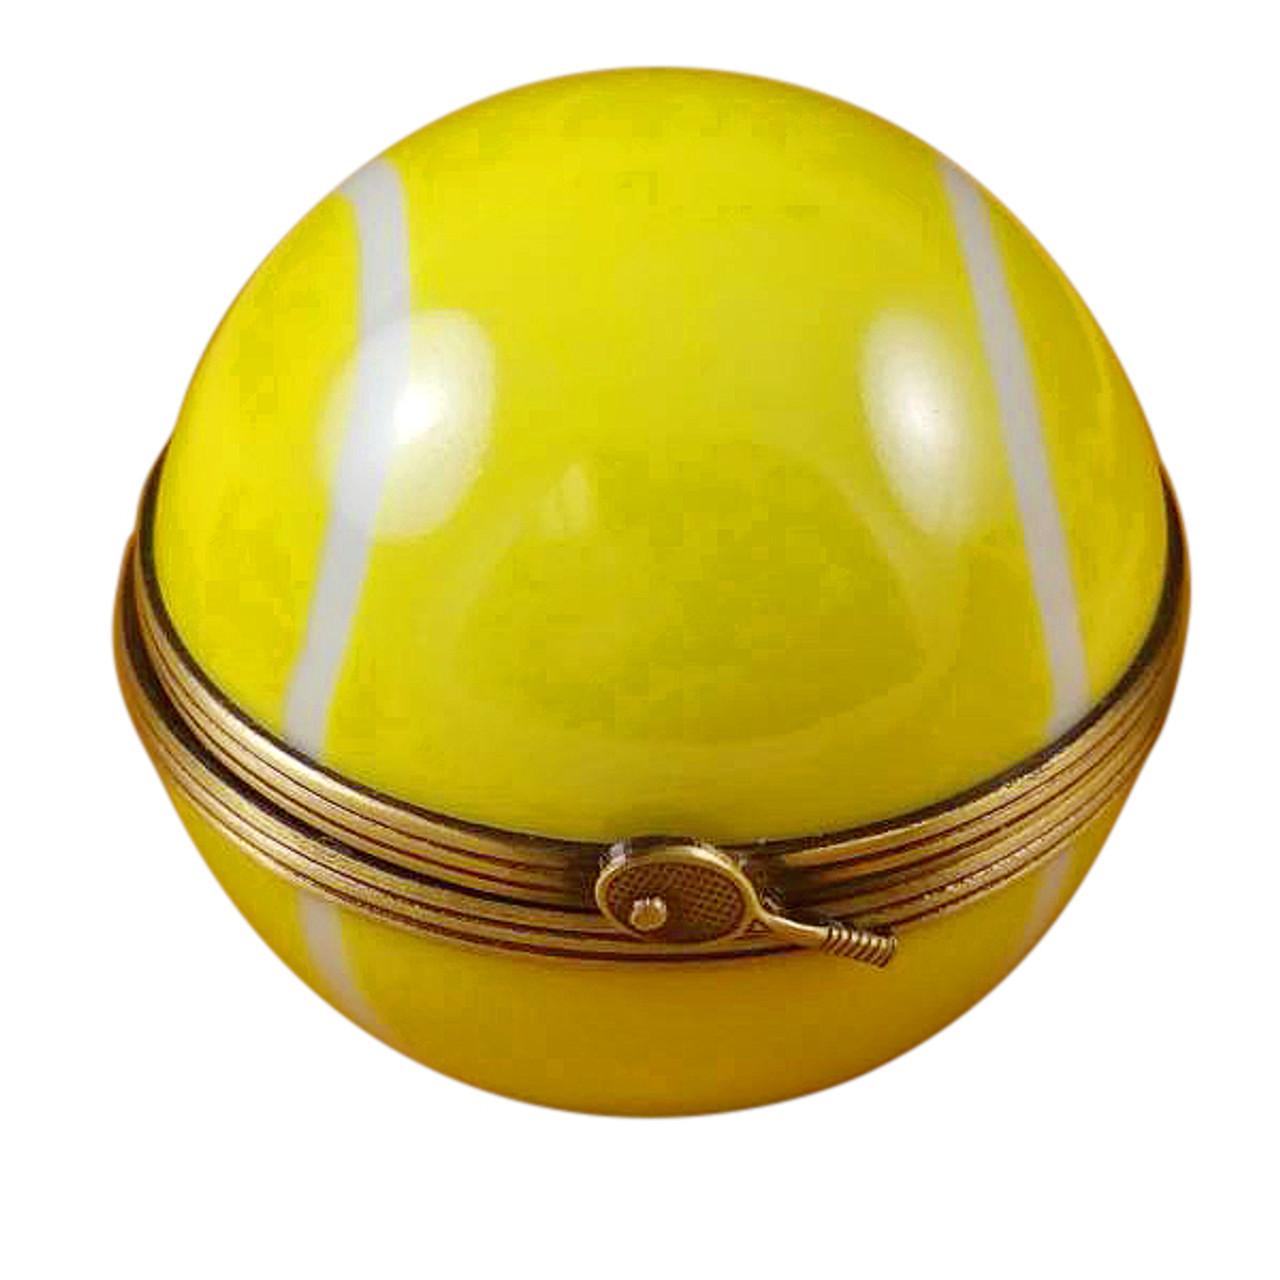 Limoges Imports TENNIS BALL Limoges Box TS095-E